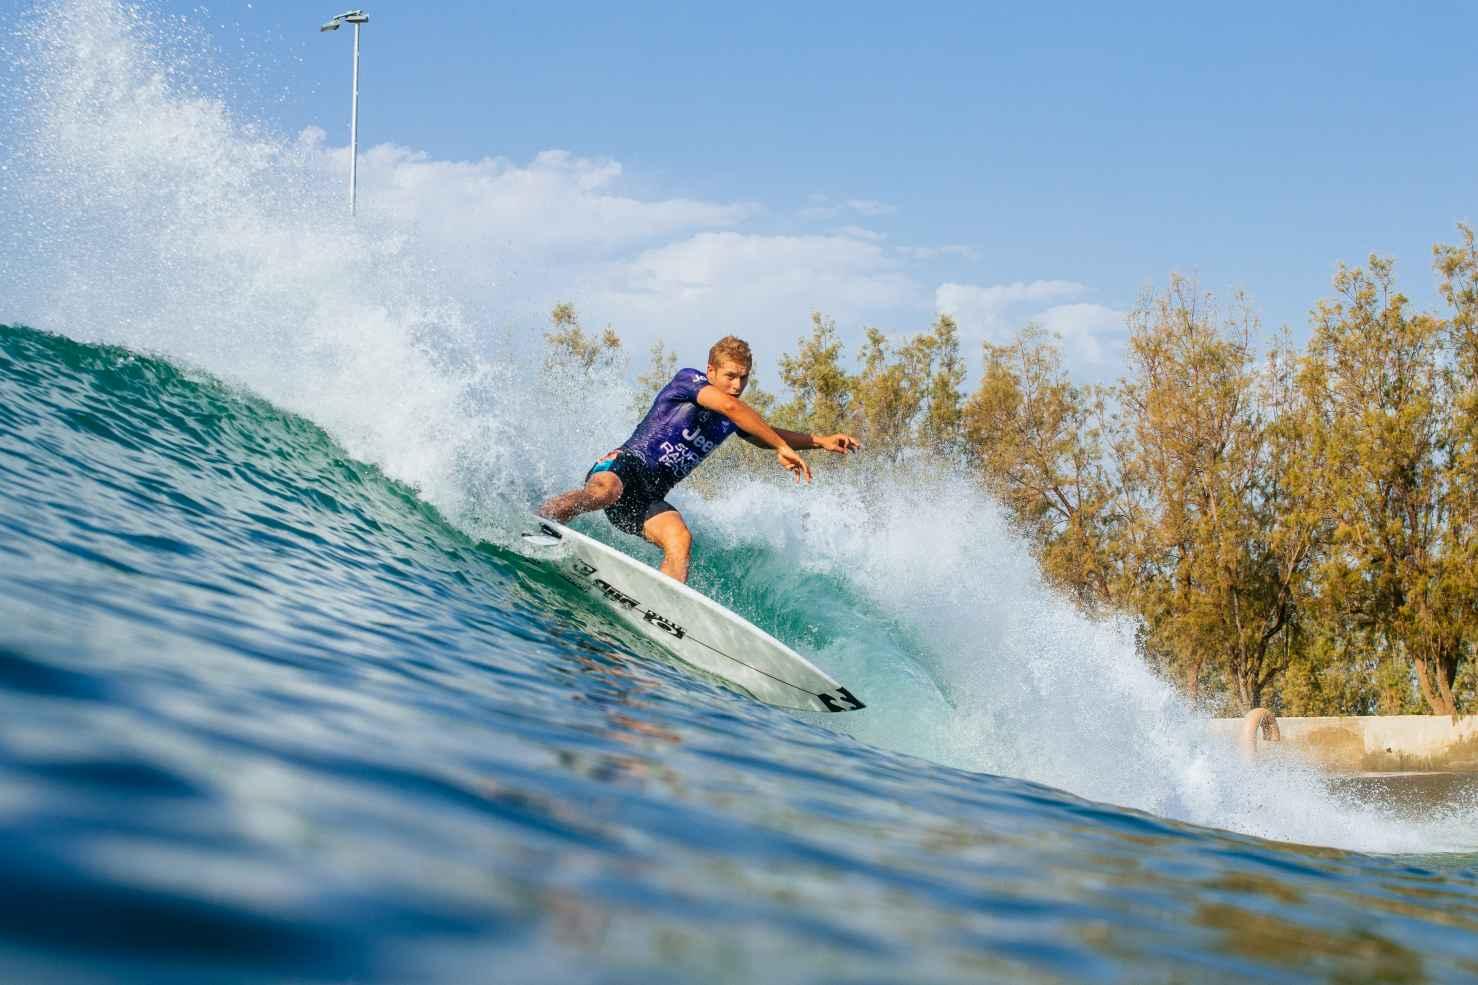 surf30 surf ranch pro 2021 wsl surf Ewing E Morris21Ranch 6091